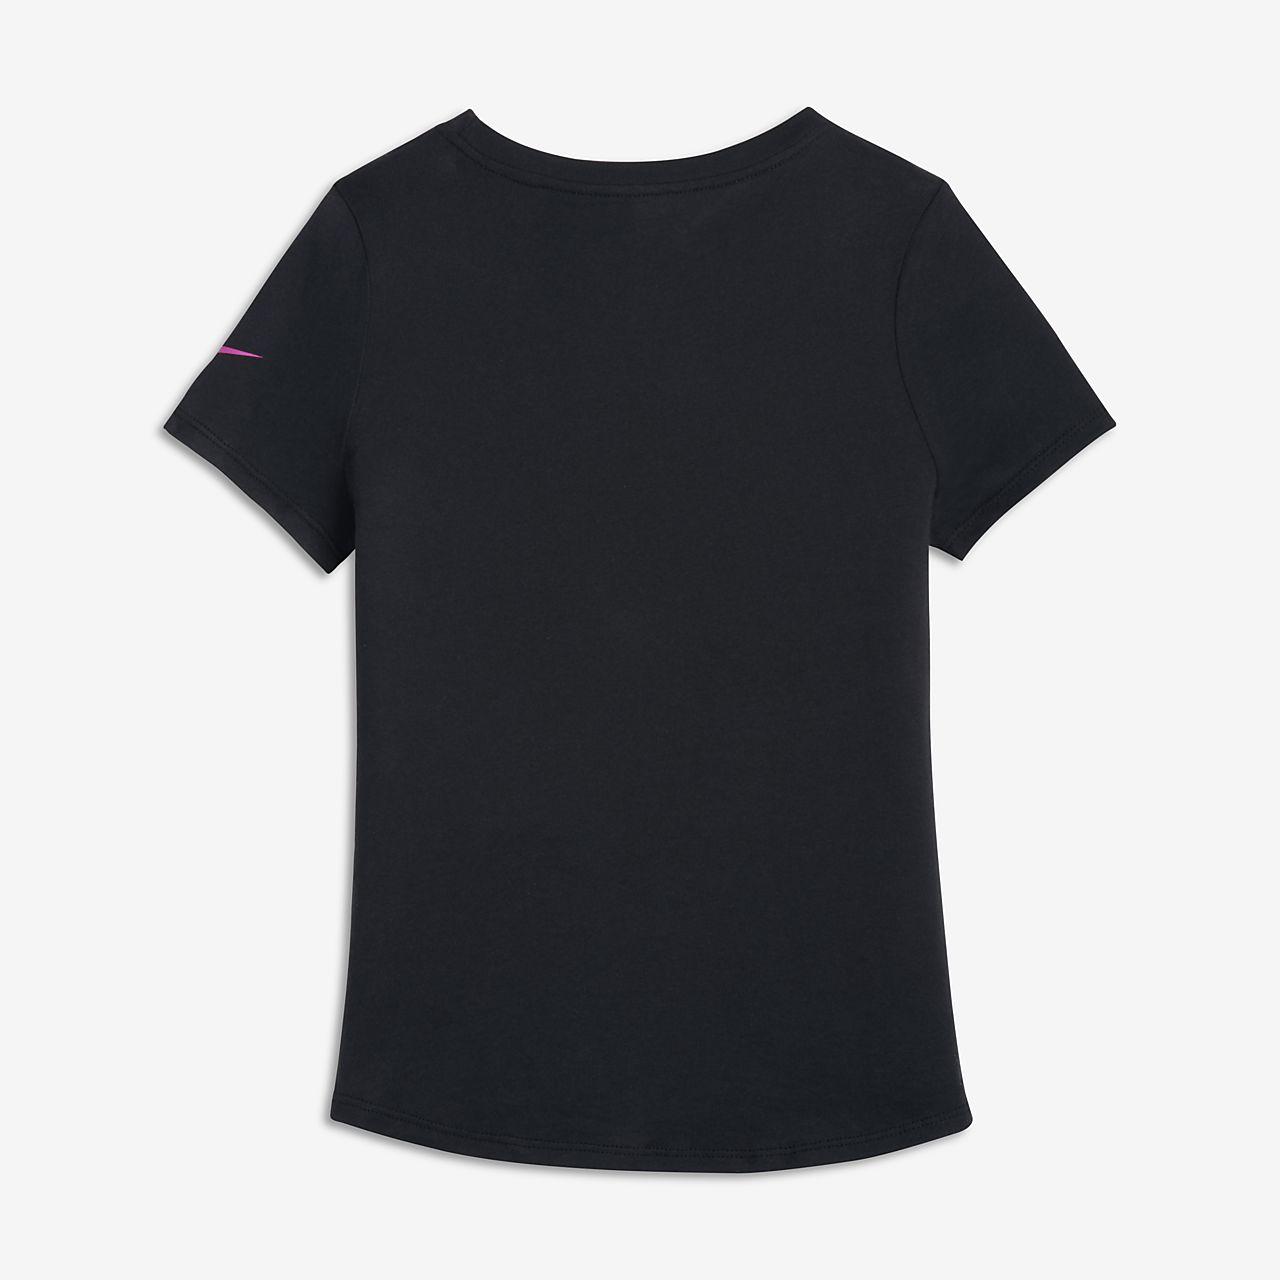 nike sportswear t shirt f r ltere kinder m dchen at. Black Bedroom Furniture Sets. Home Design Ideas